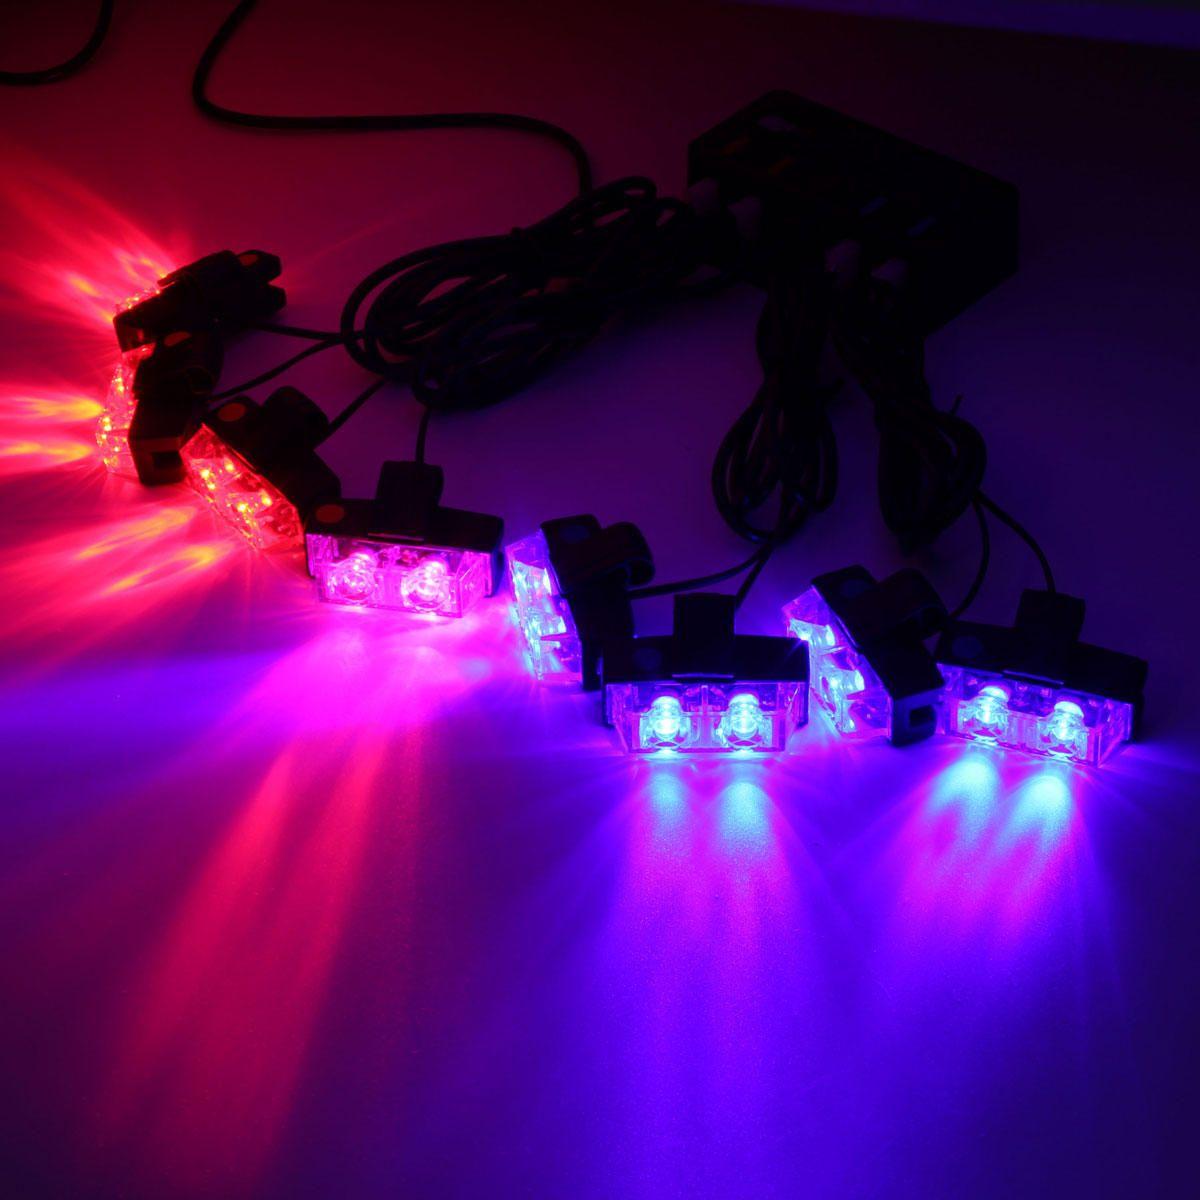 QES US$26.49 30W 8Pcs Lamp 16 LED Emergency Flashing Warning Lights Wireless Remote Grille Strobe